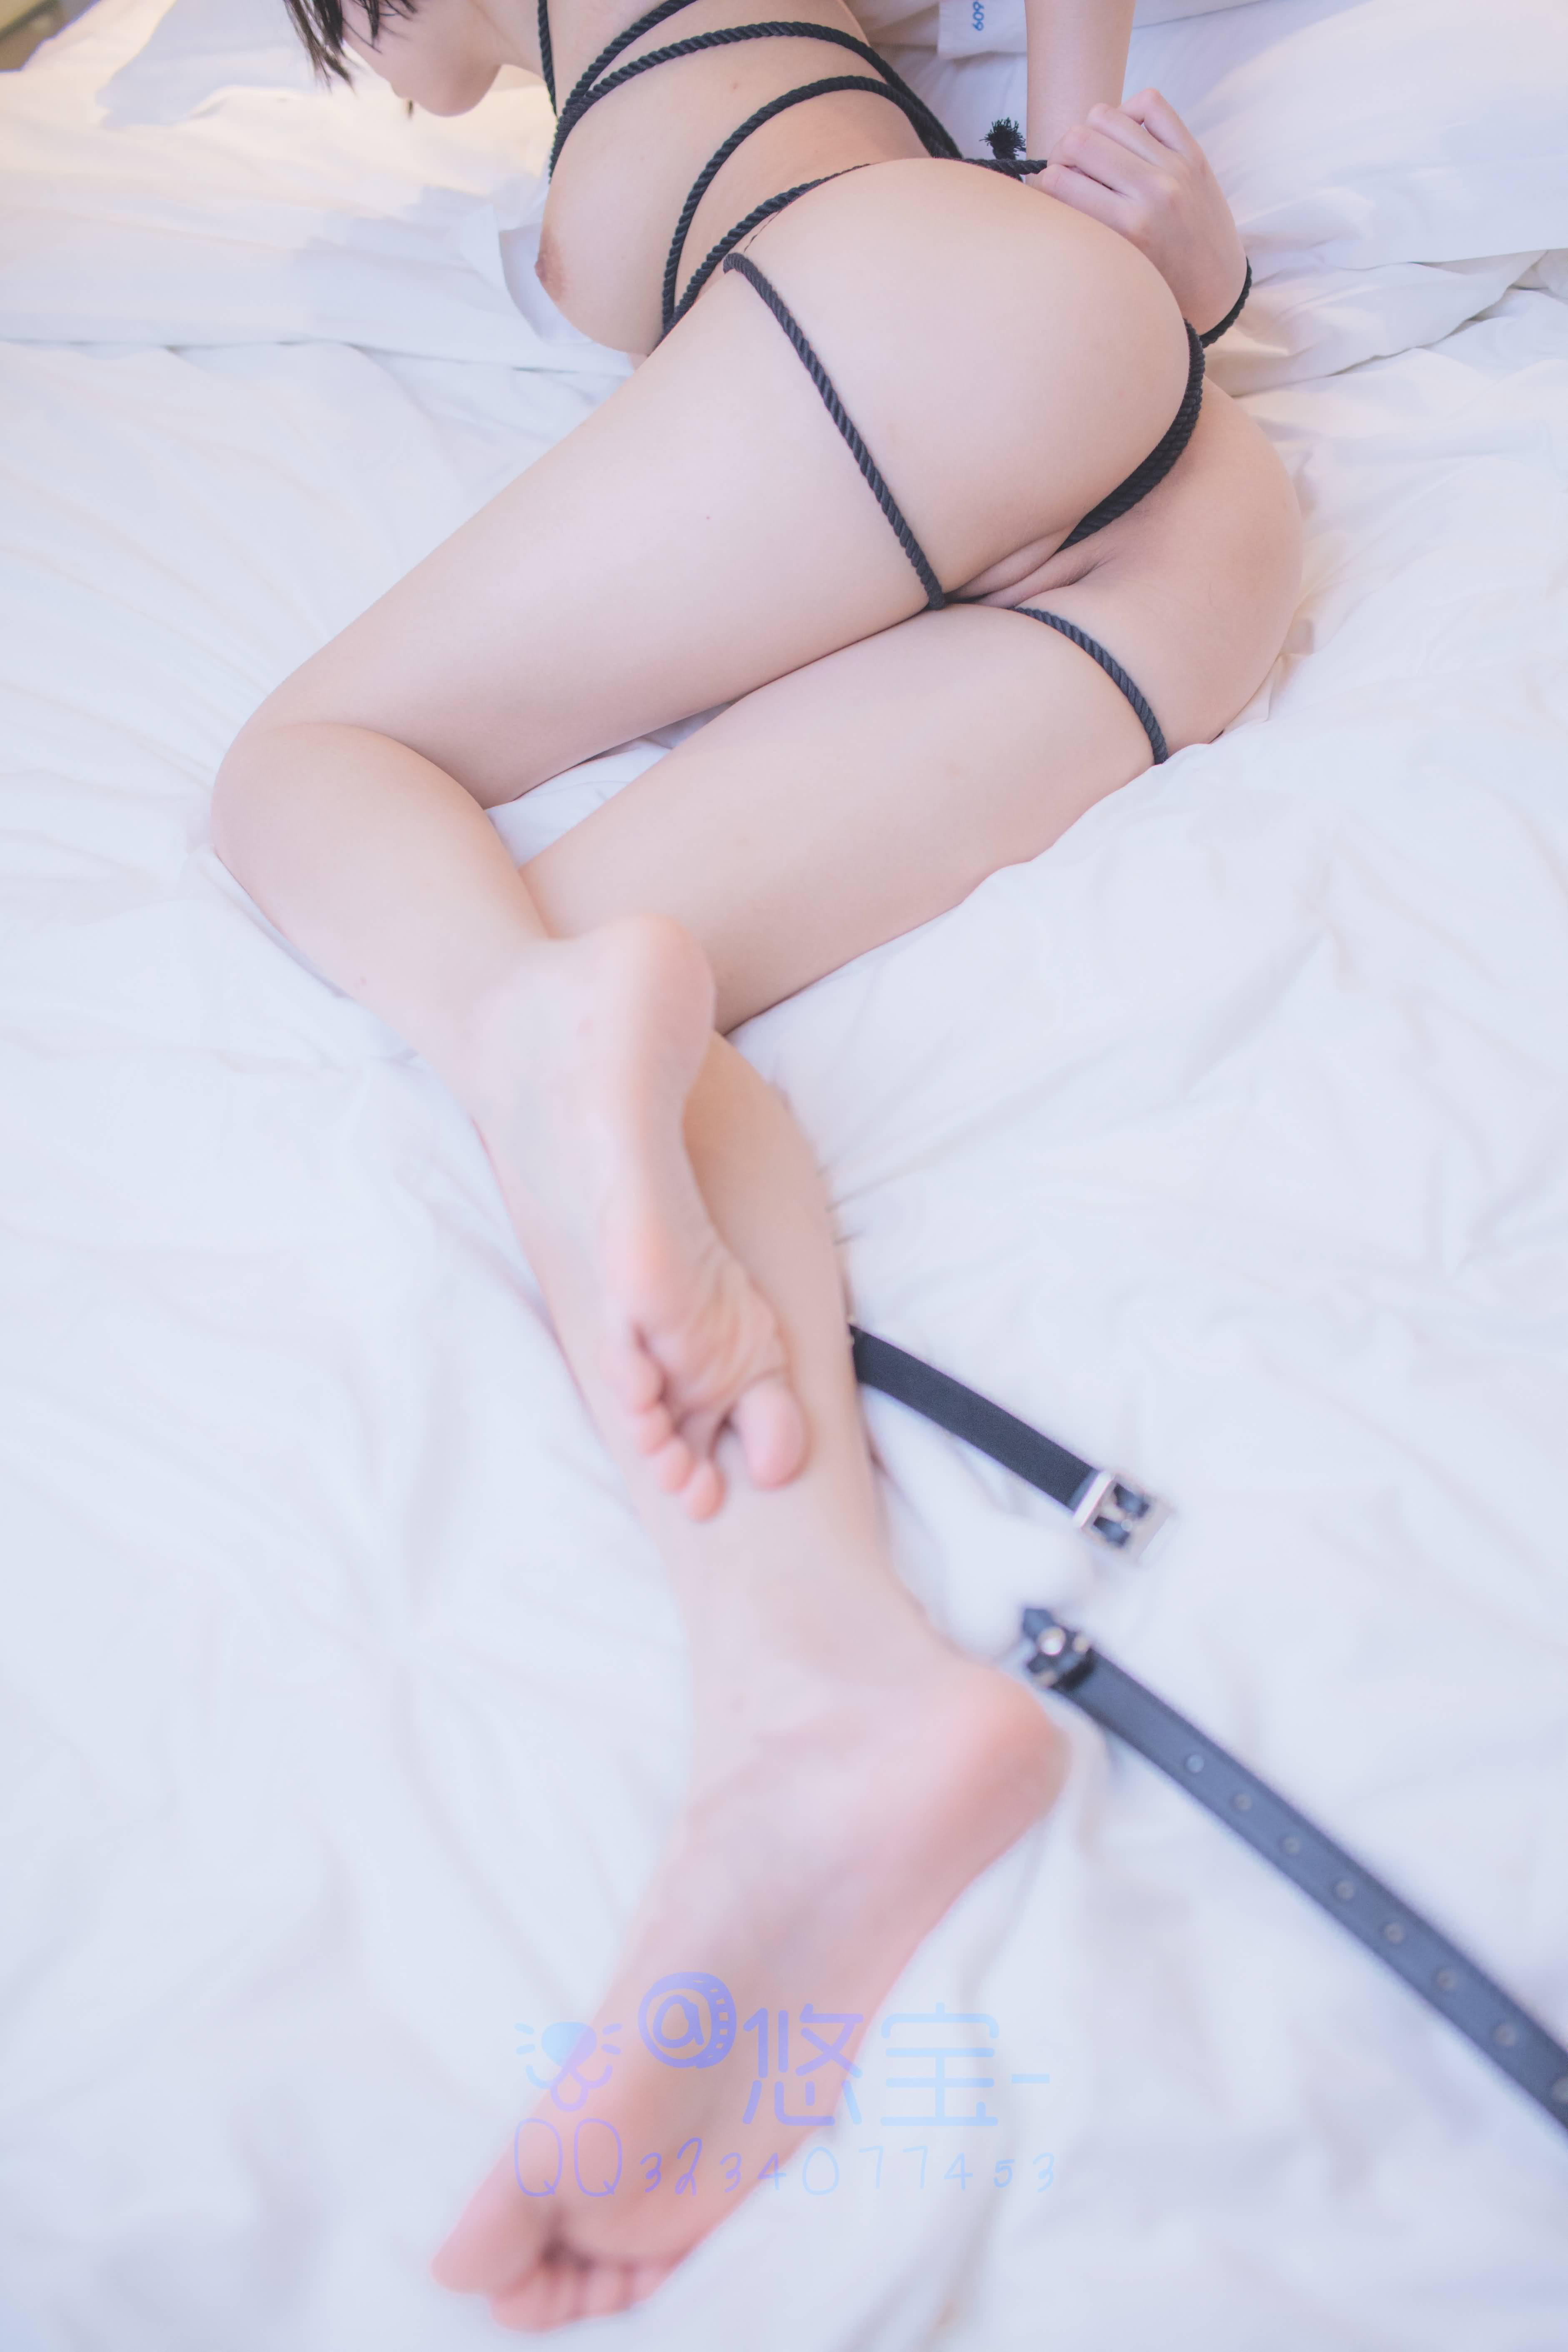 nRYNBt - Japanese school girl white swimsuit stocking cosplay SM bundle masturbation 悠宝三岁 白丝死库水